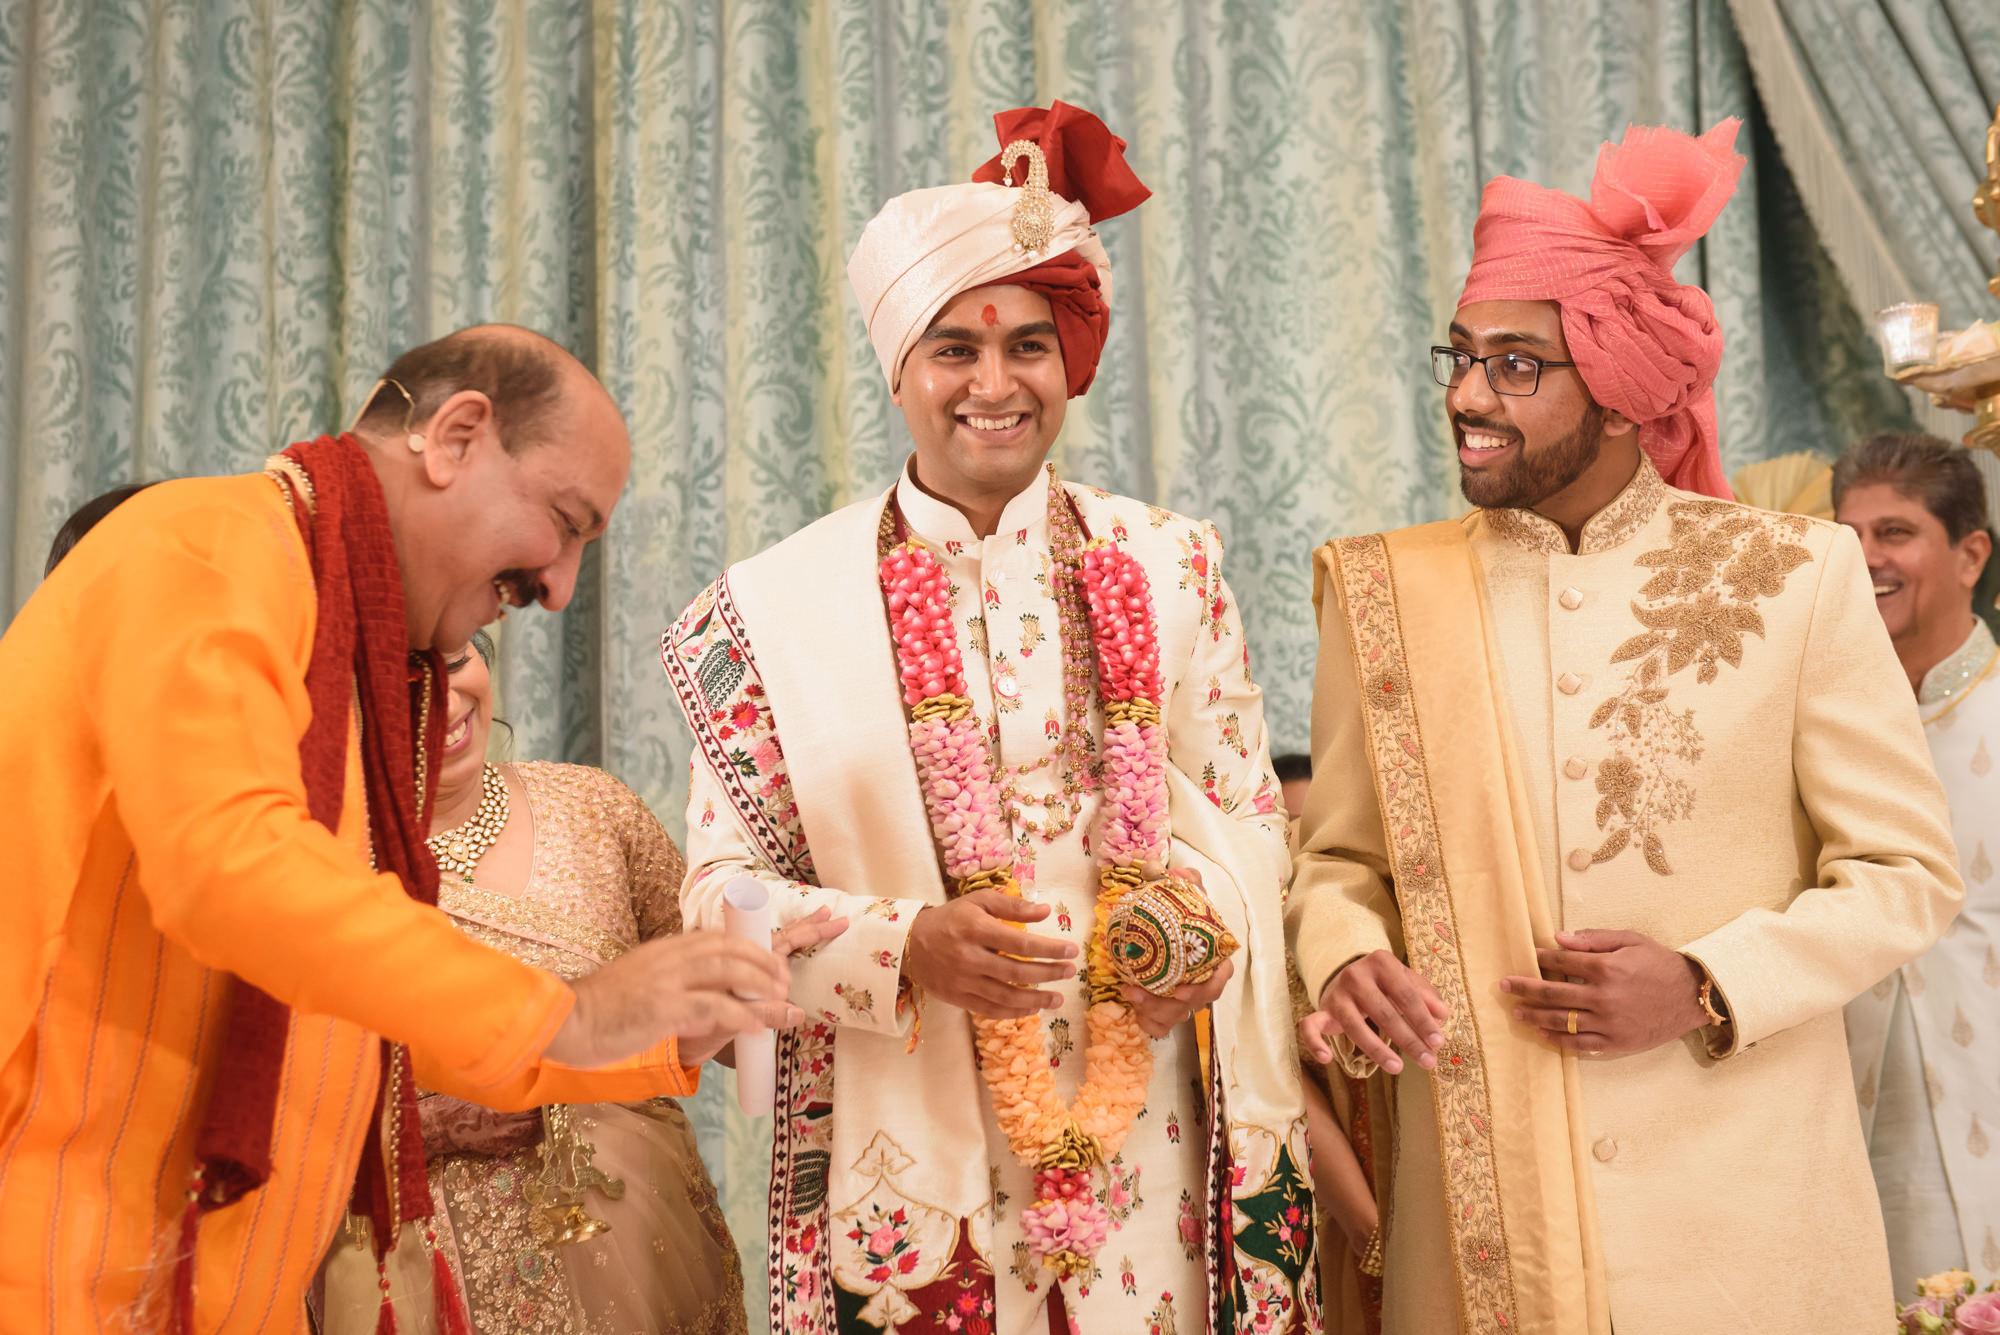 Tamil Gujrati hindu wedding photography photographer london the savoy -29.jpg